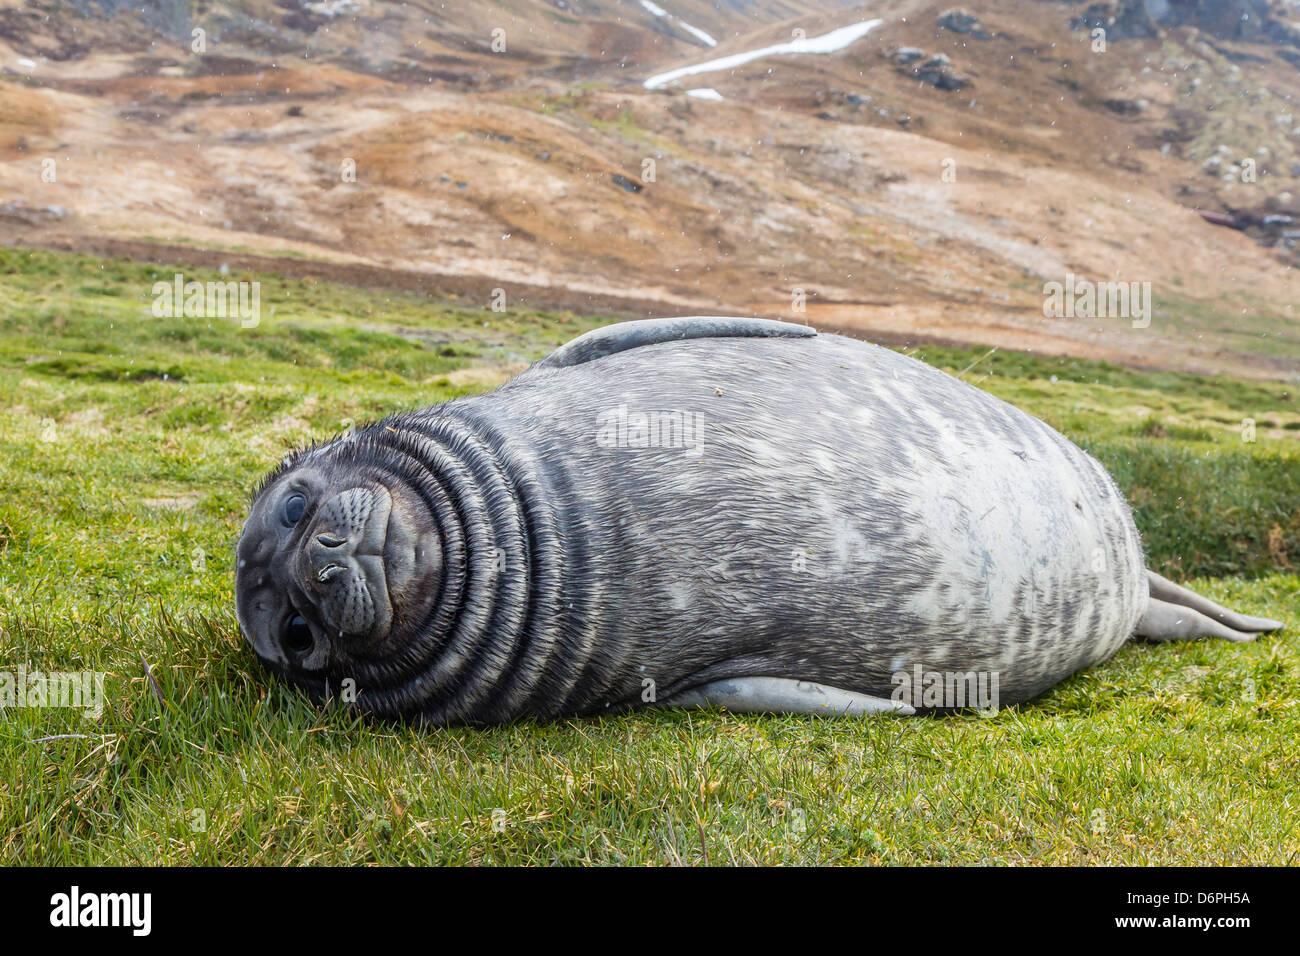 Southern elephant seal (Mirounga leonina) pup, Grytviken Whaling Station, South Georgia, South Atlantic Ocean, Polar - Stock Image